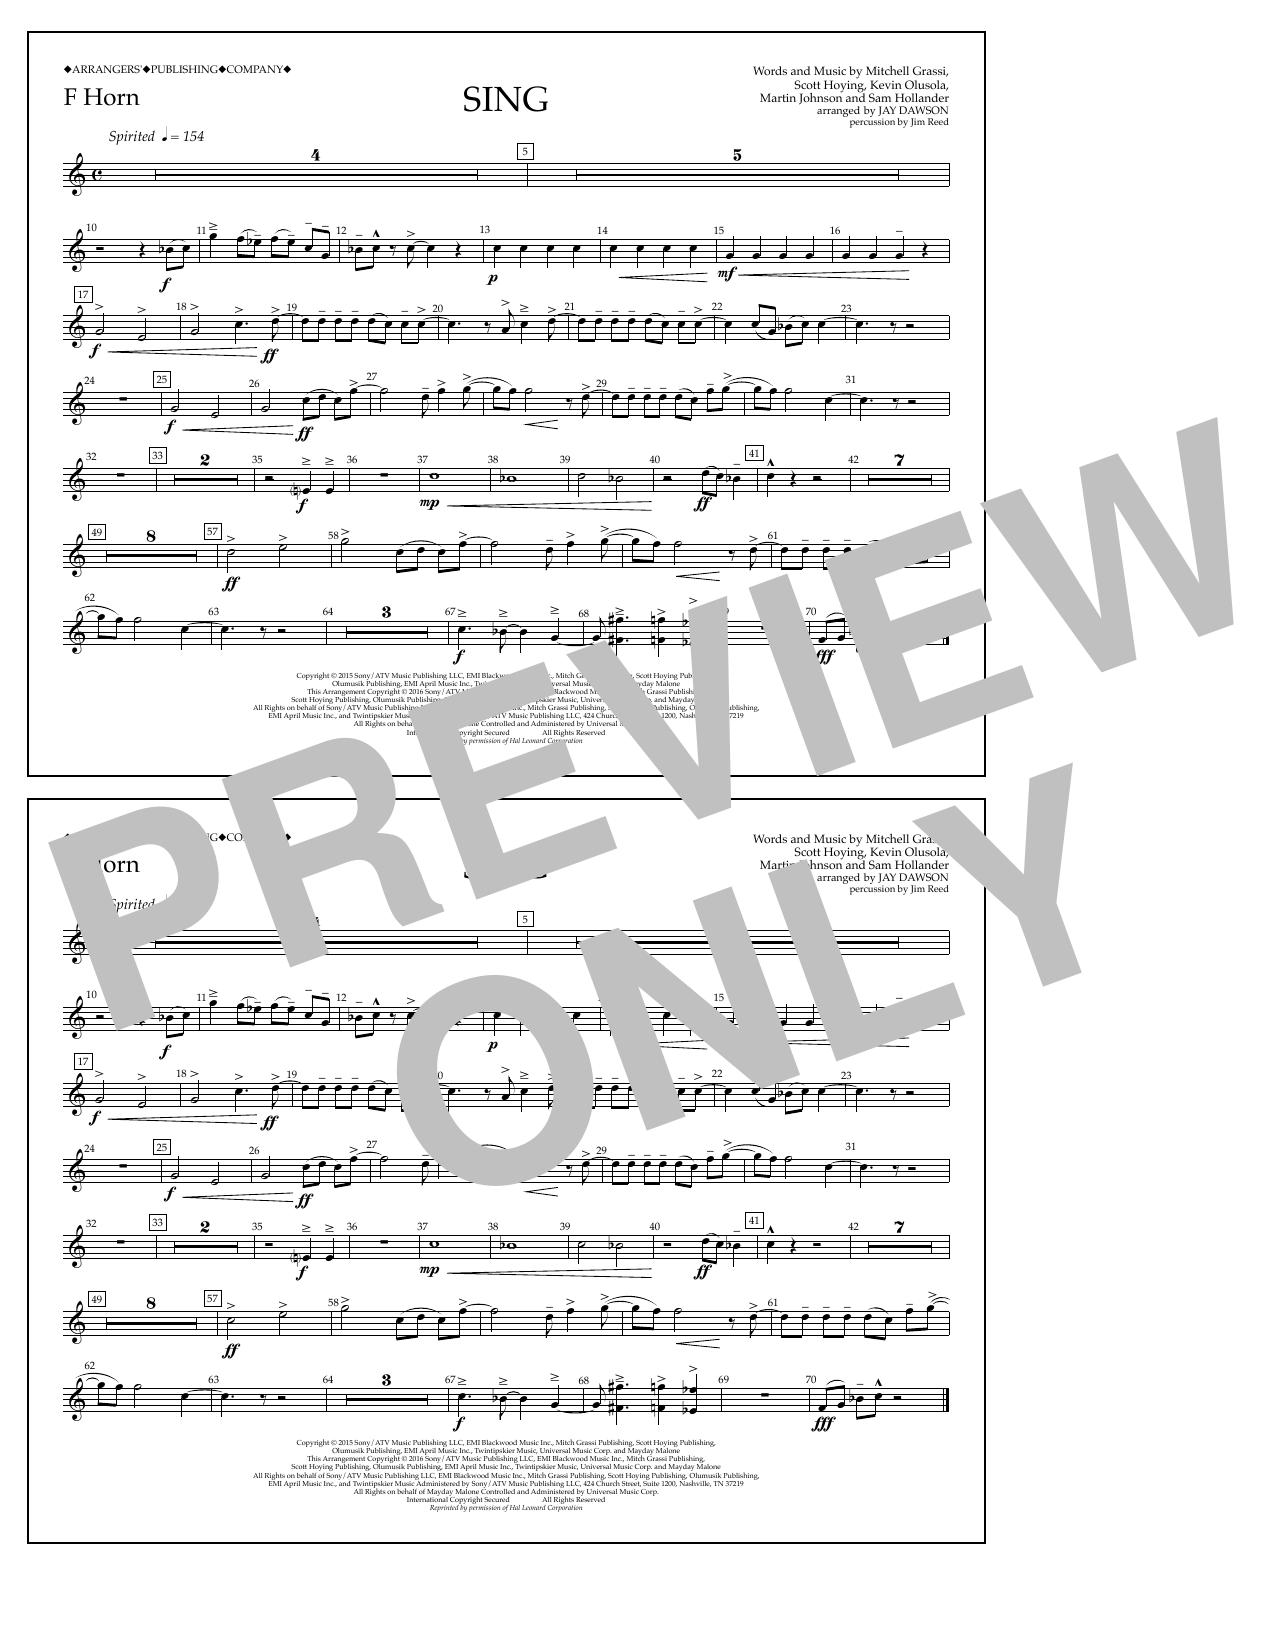 Pentatonix - Sing - F Horn